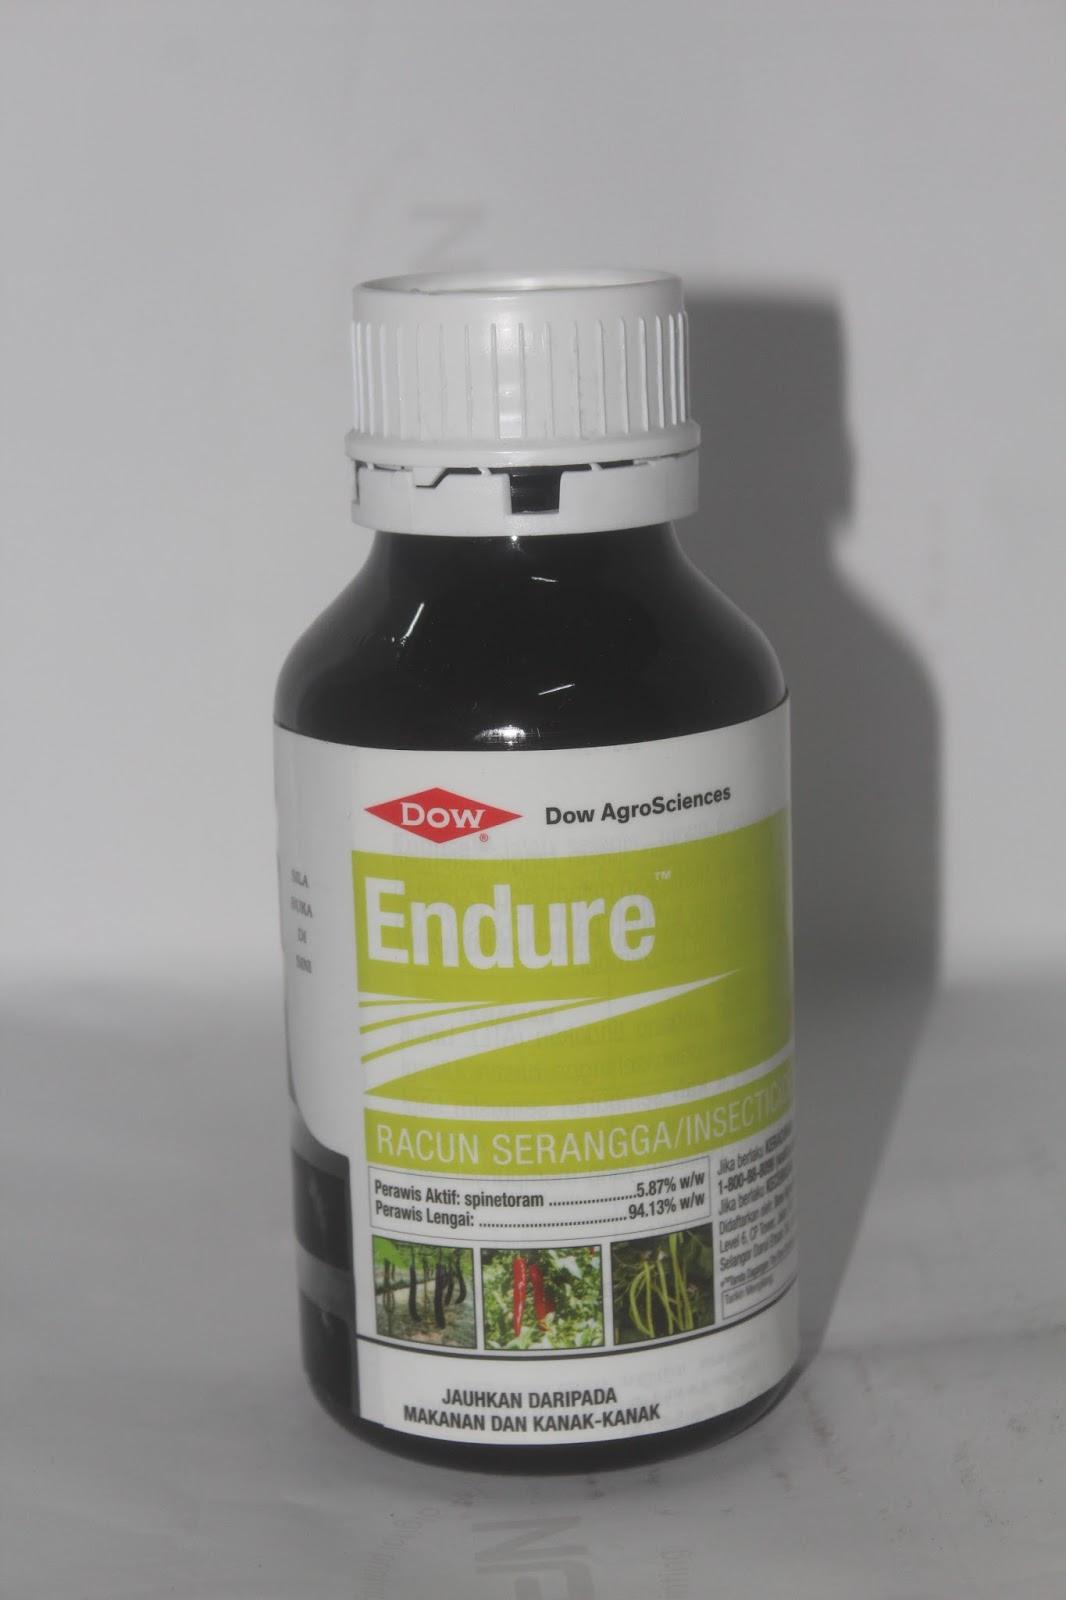 Endure - RM202.00